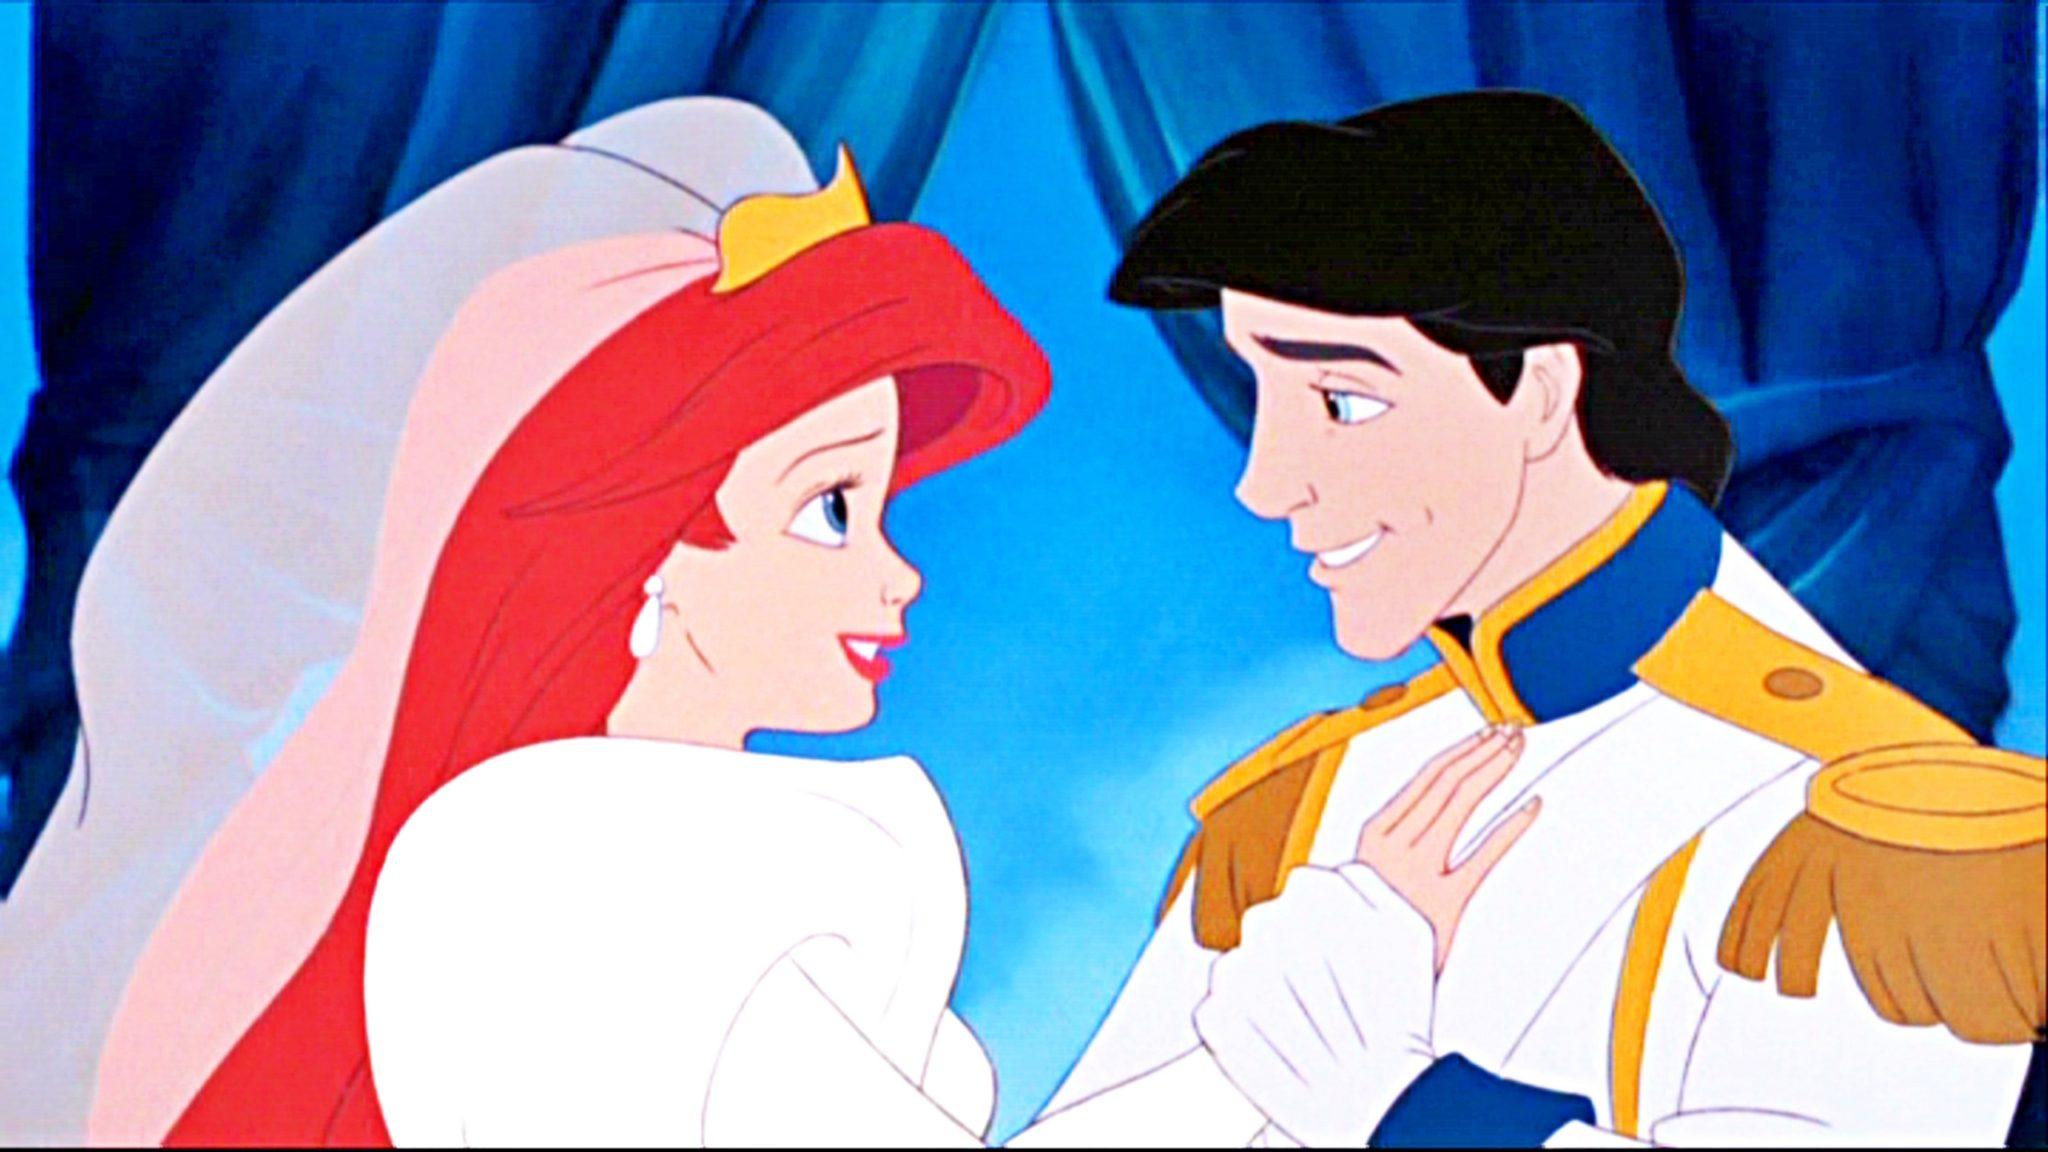 walt-disney-screencaps-princess-ariel-prince-eric-the-little-mermaid-29653531-2560-1440